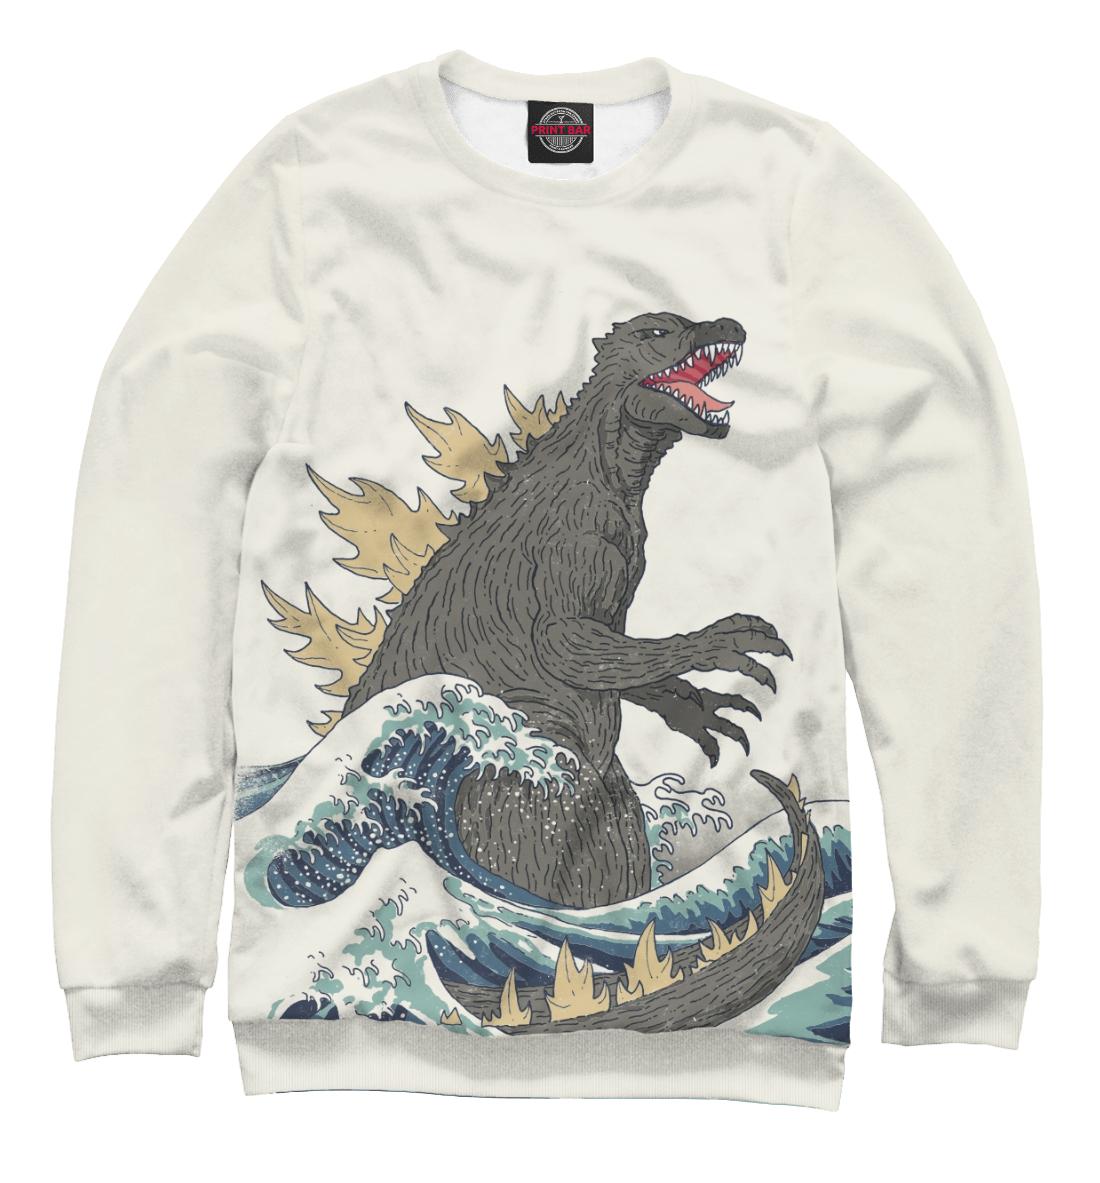 Купить Godzilla, Printbar, Свитшоты, KNO-948120-swi-1